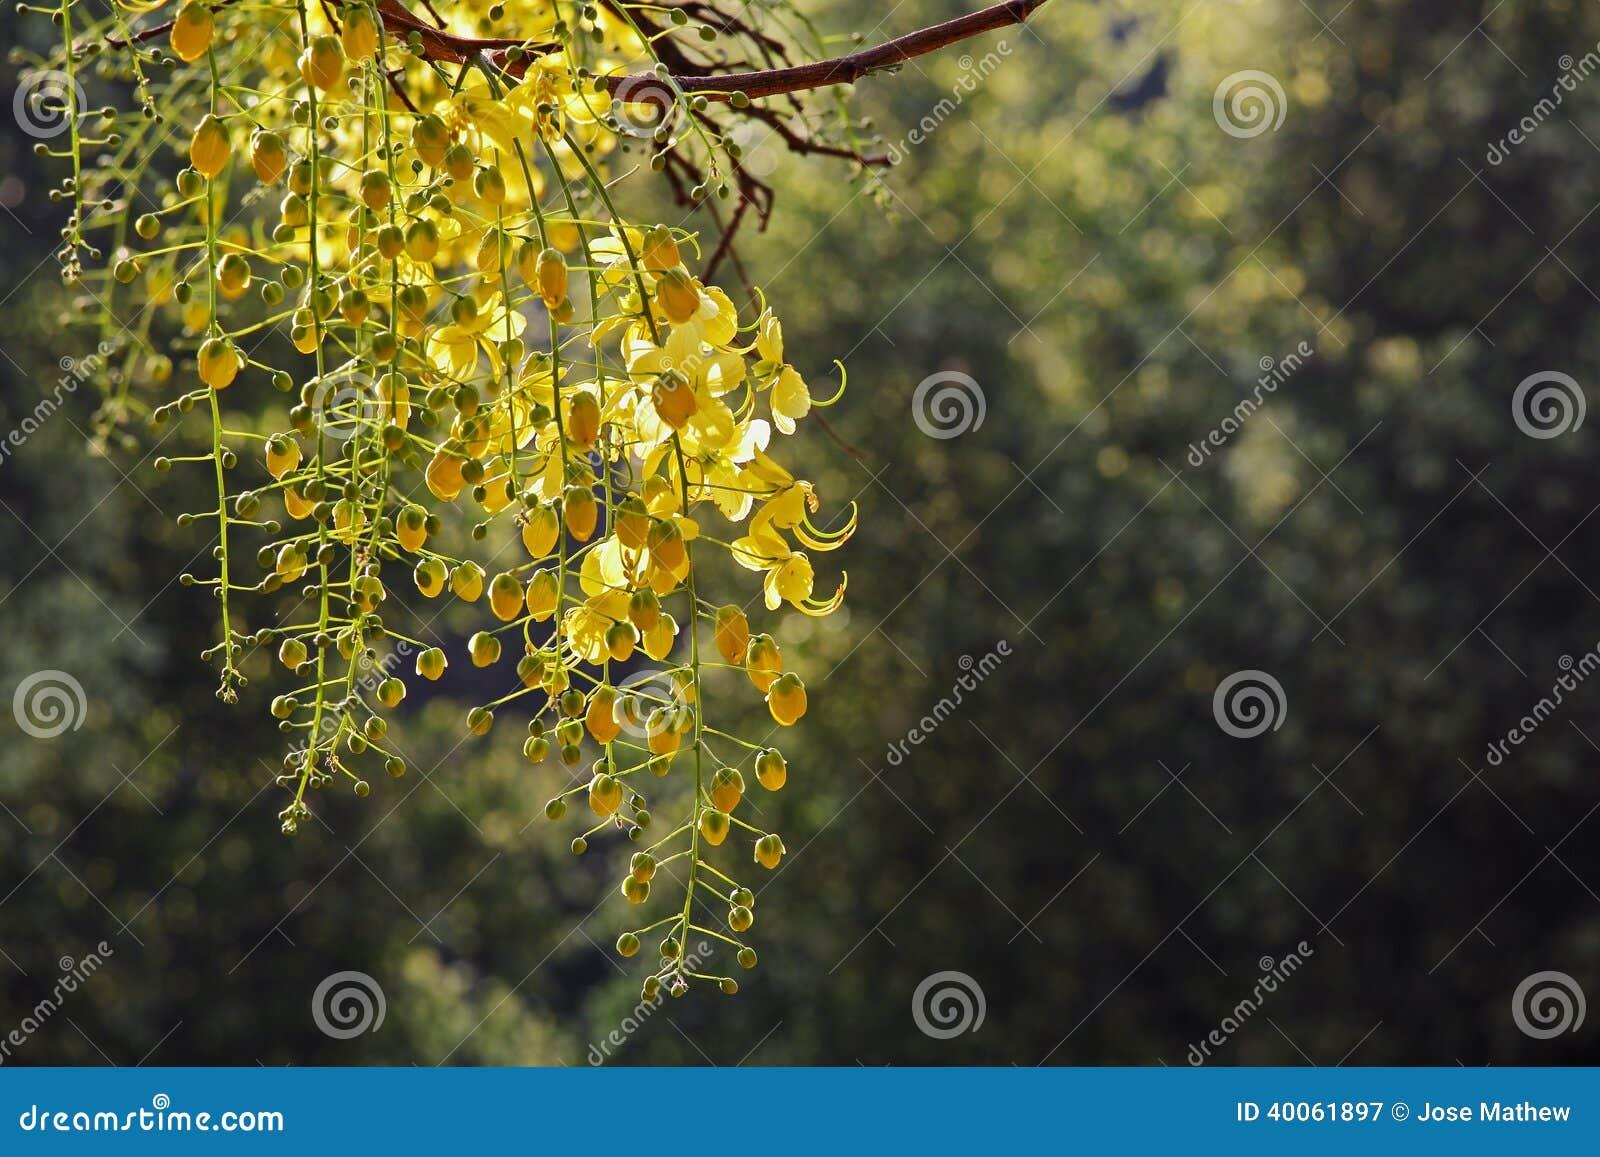 Golden shower flowers